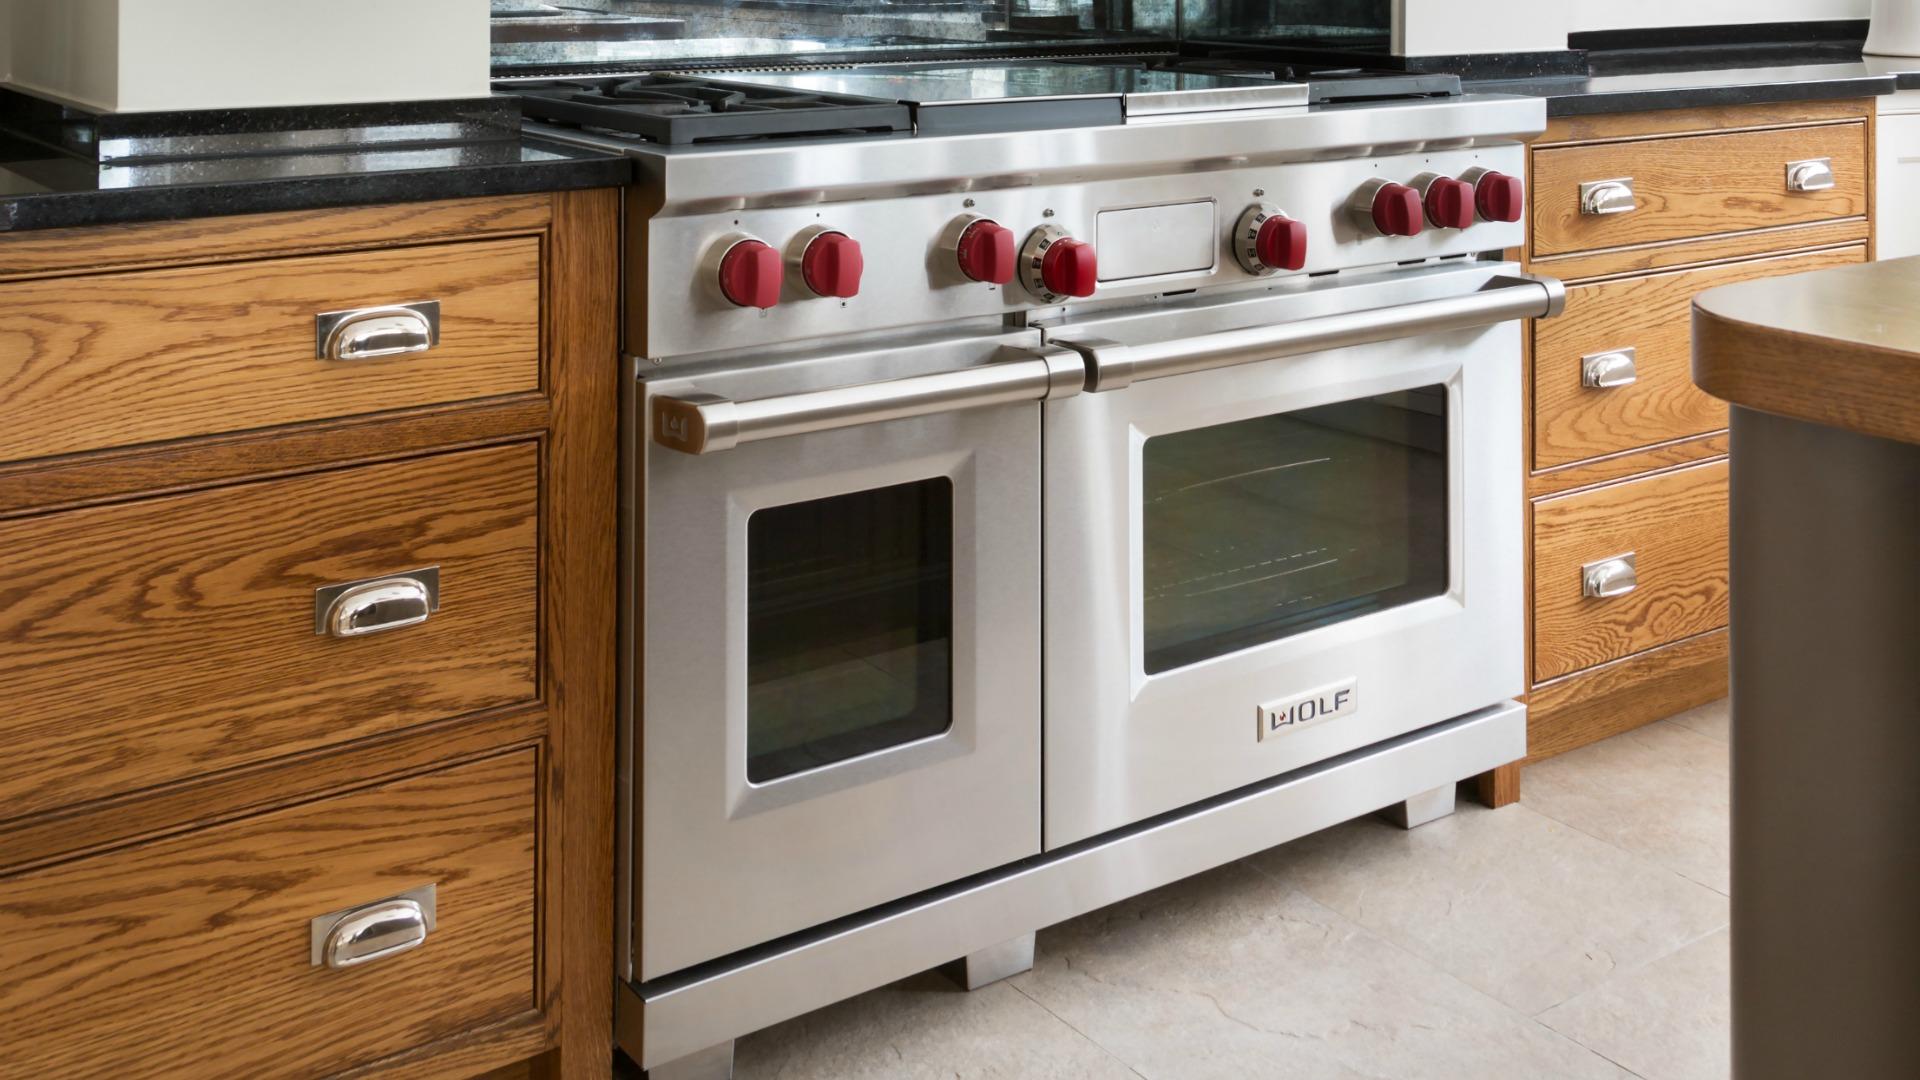 Wolf Range Cooker - Teppanyaki - Chargrill - Humphrey Munson - Beautiful Handmade Kitchens